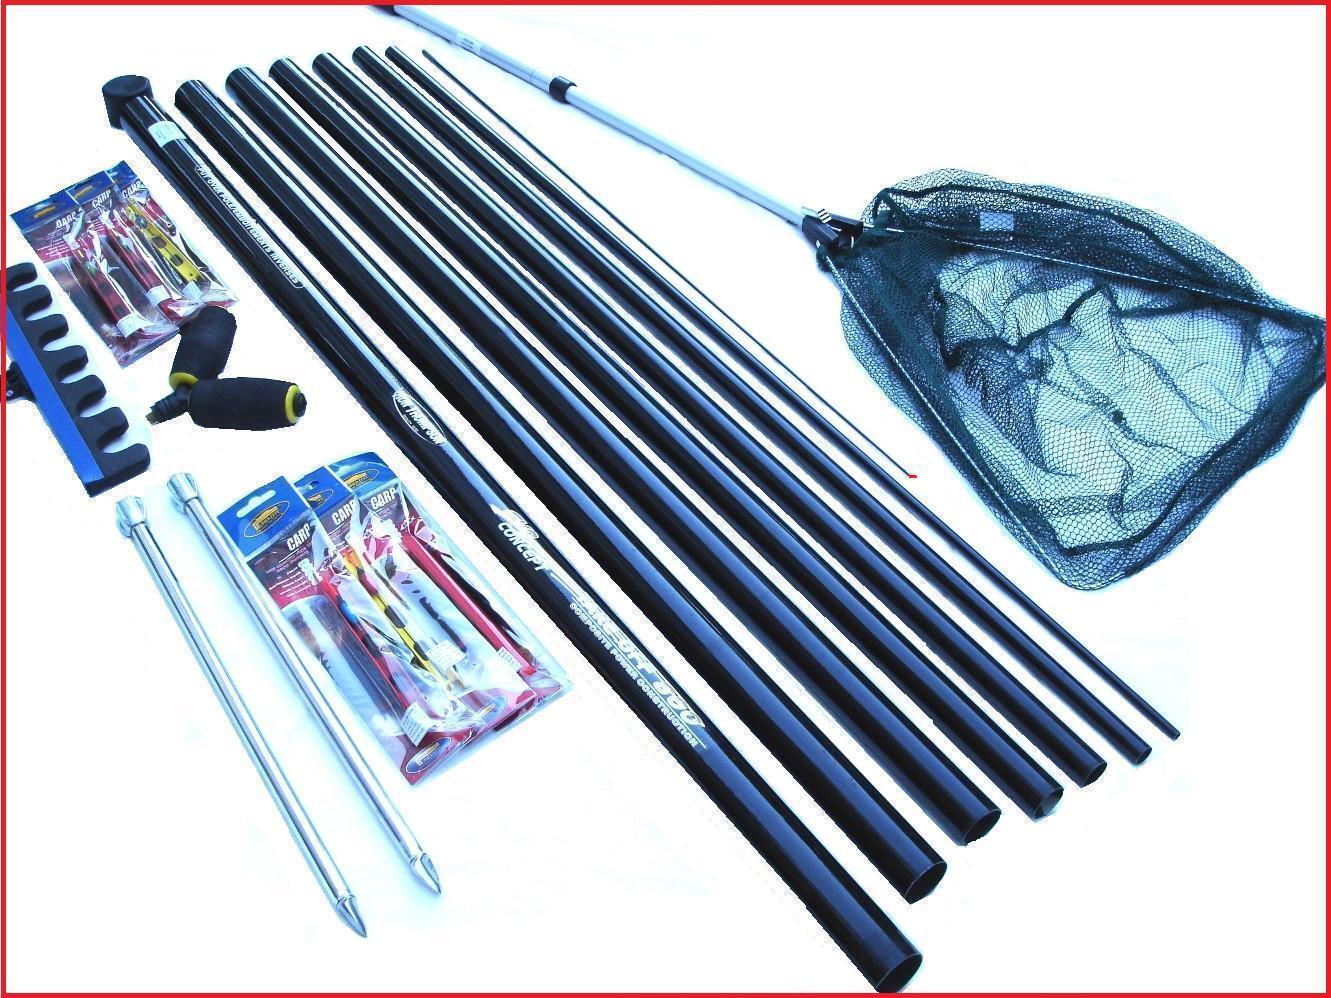 Shakespeare Starter Fishing Pole Kit Elastic Fitted  Rigs Roost Roller Rest Net